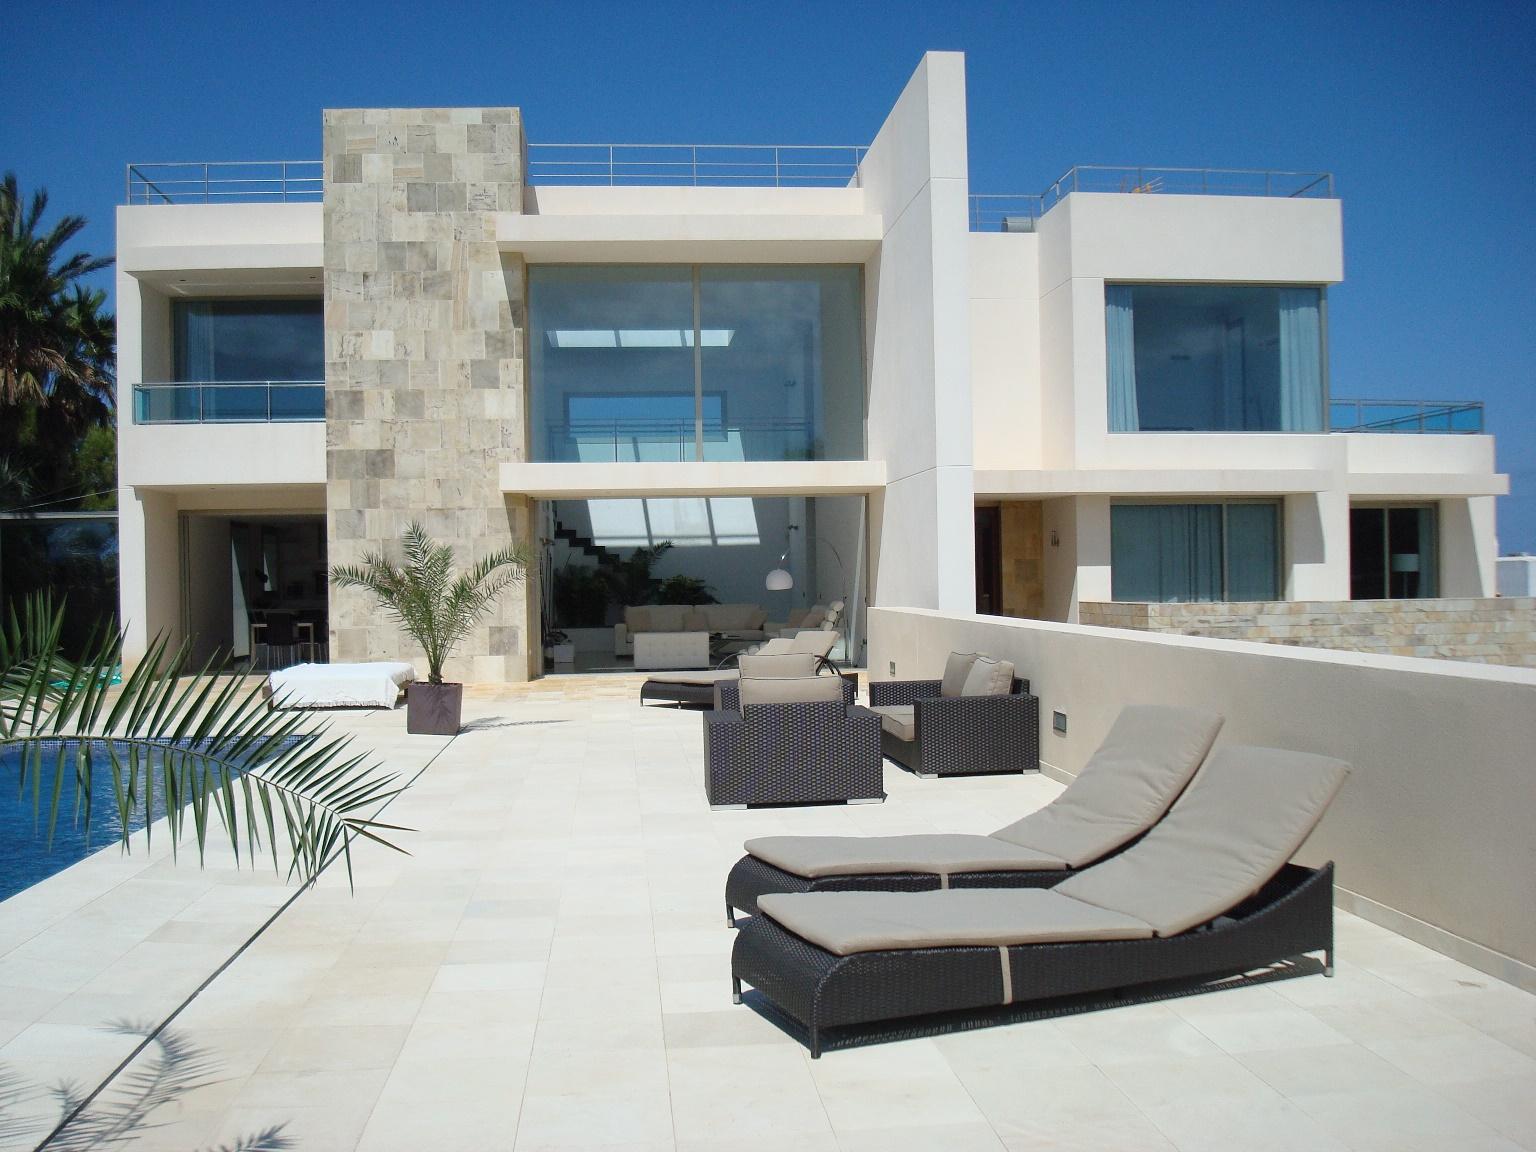 Alquiler vacacional en ibiza villas for Villa de casas